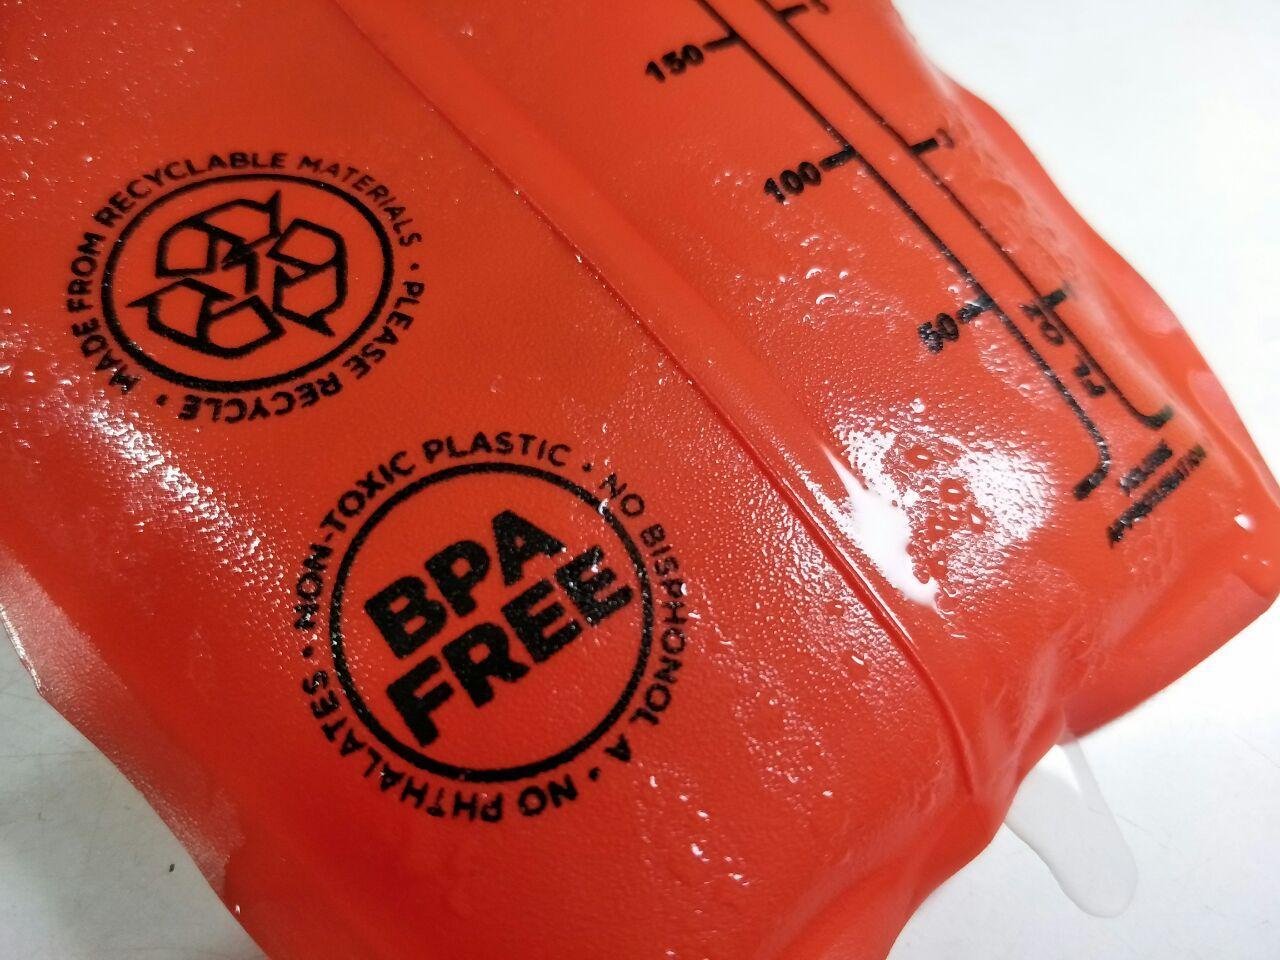 BPA and Phthalates